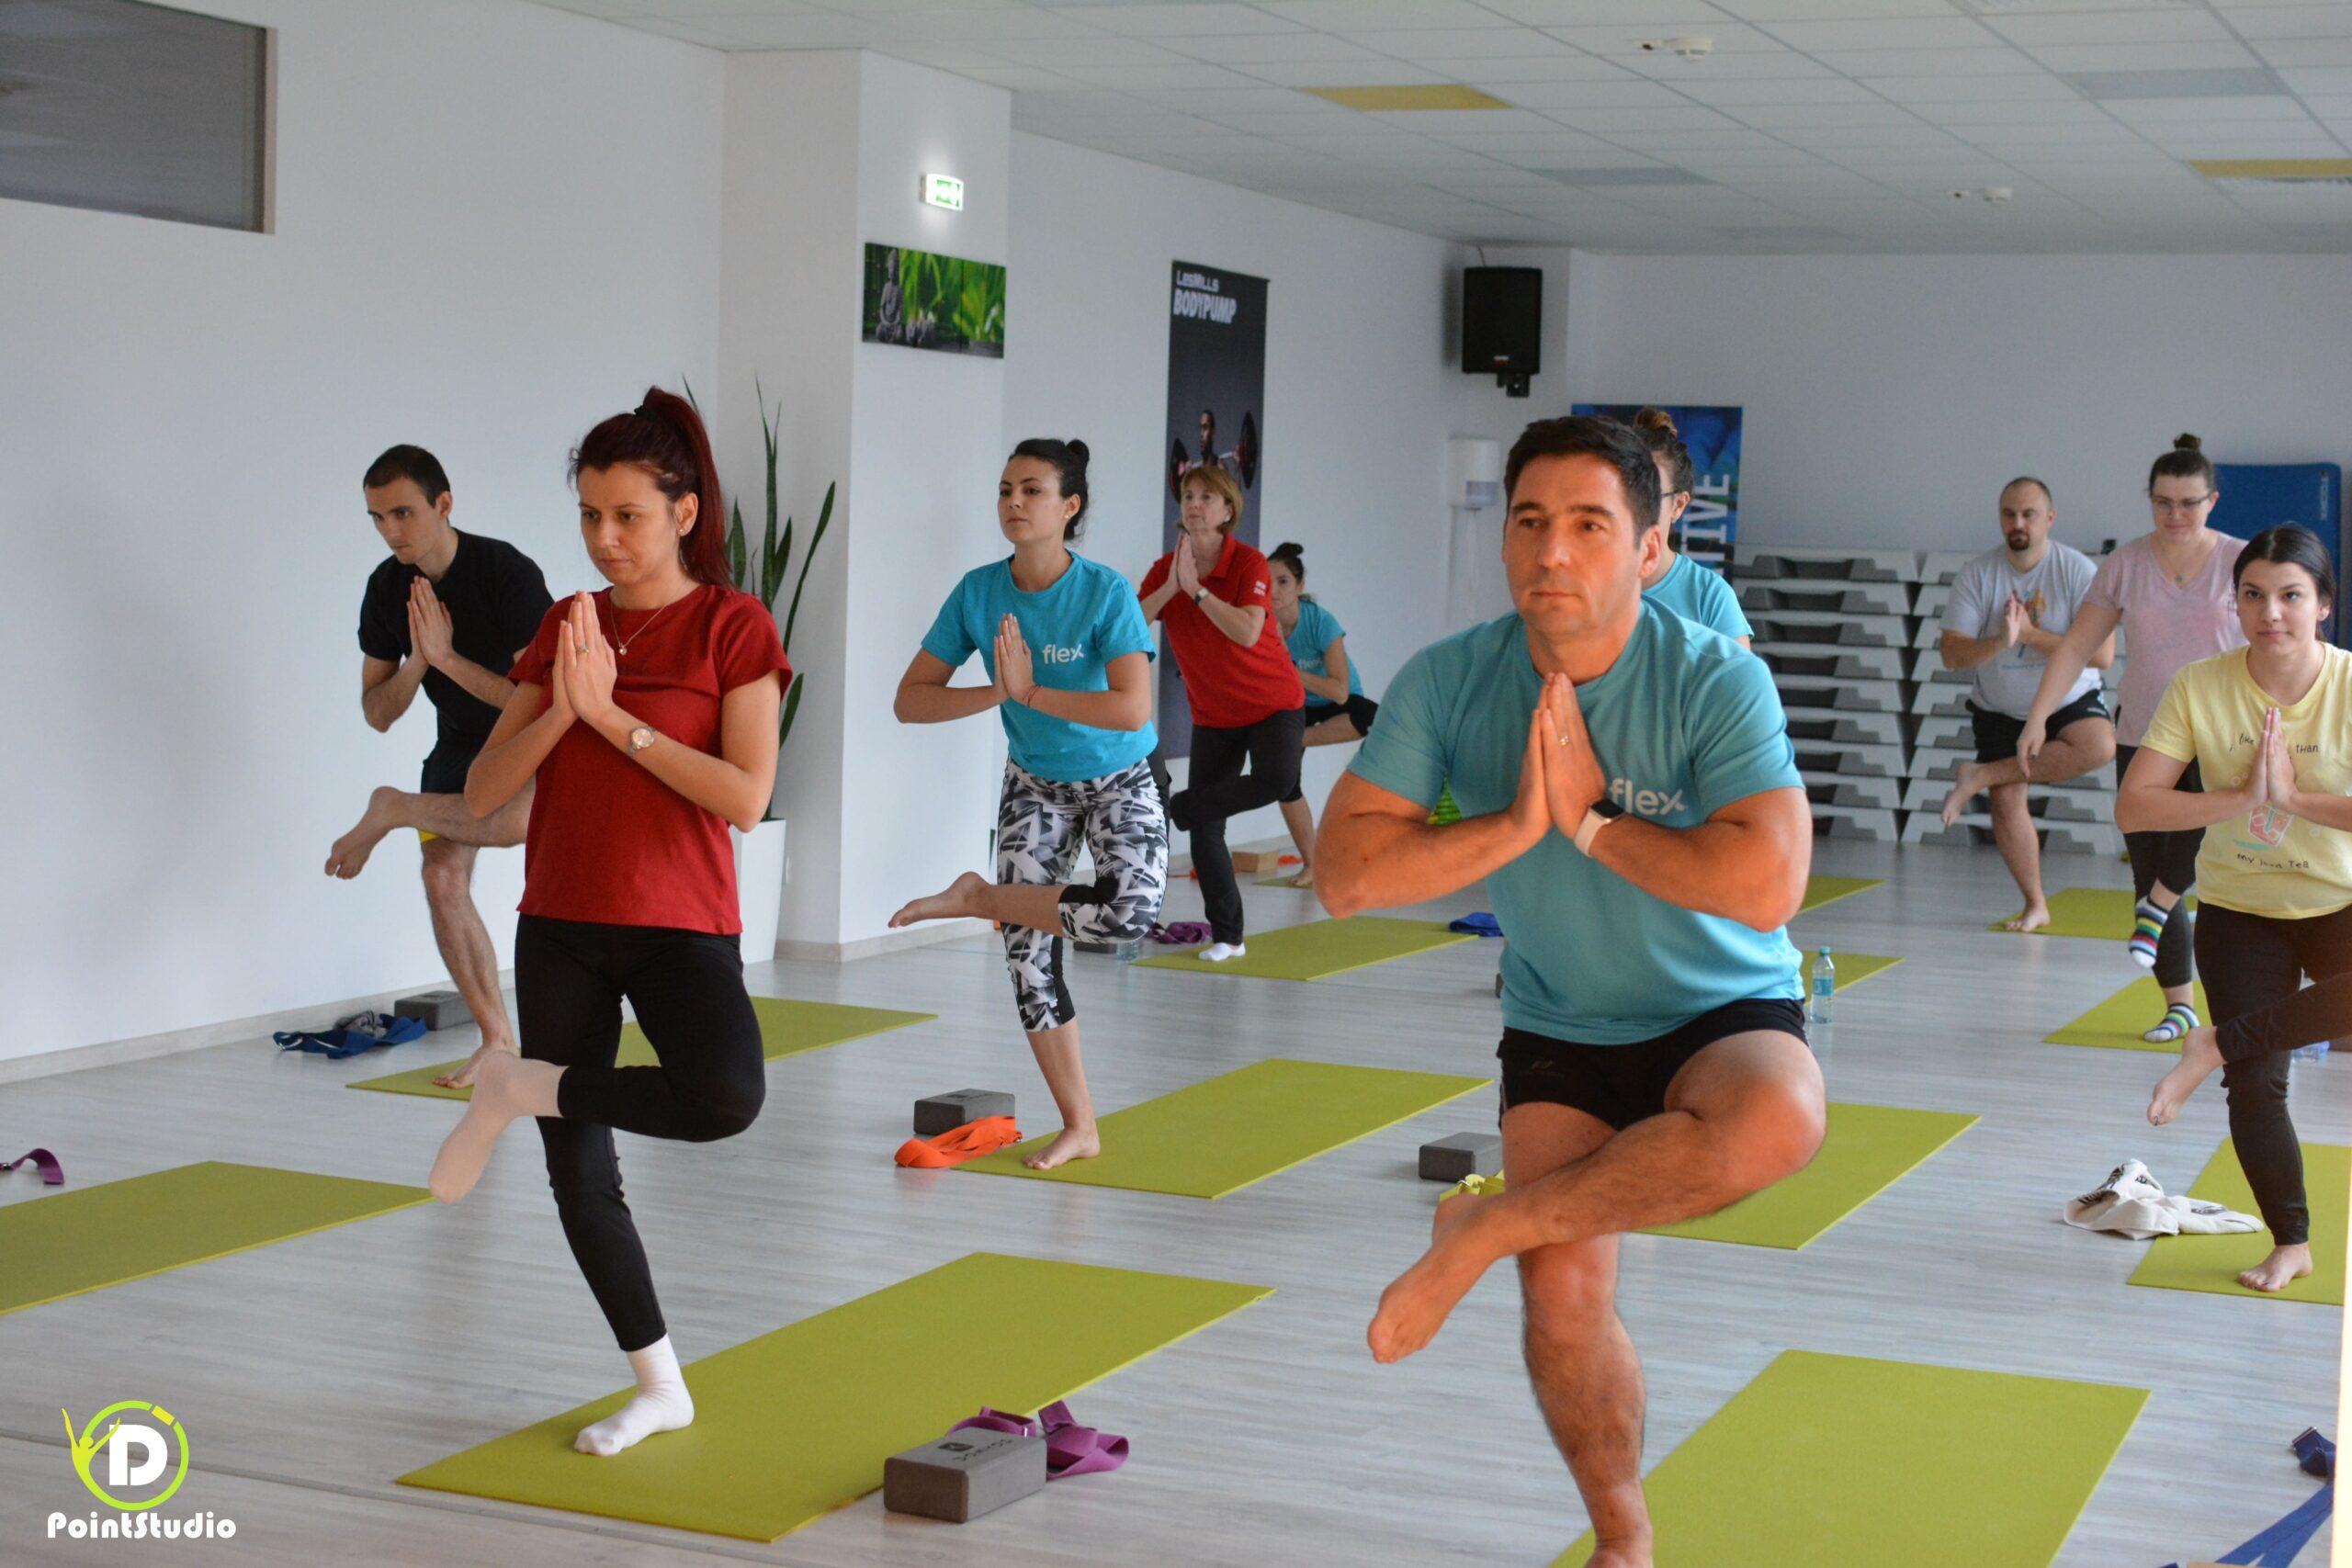 Yoga & Office Works - Flex at D' Point Studio